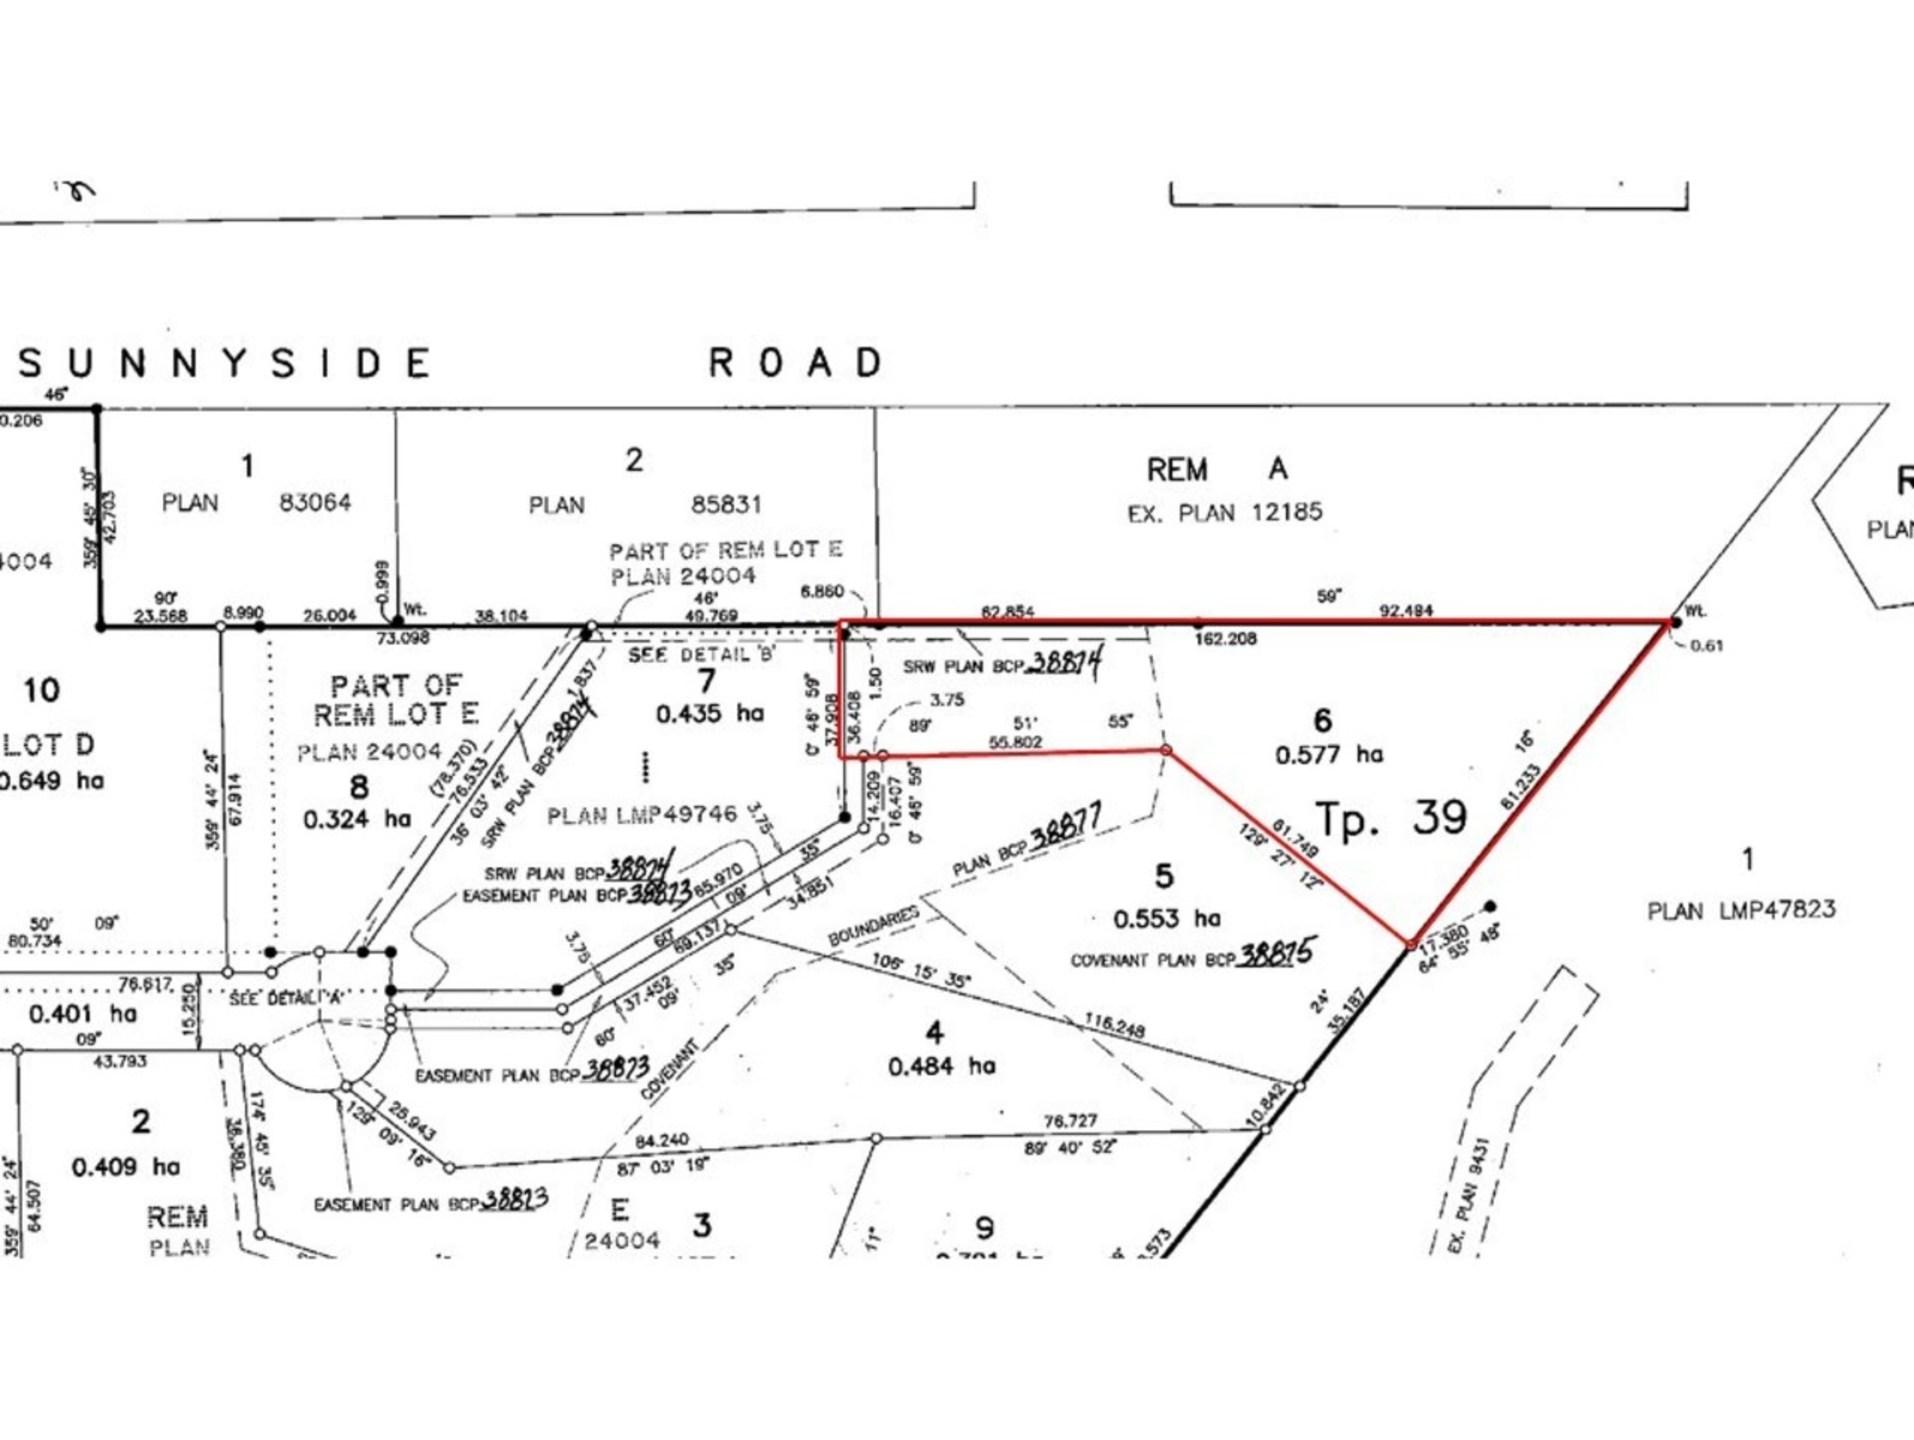 2199-summerwood-lane-anmore-port-moody-01 at 2199 Summerwood Lane, Anmore, Port Moody